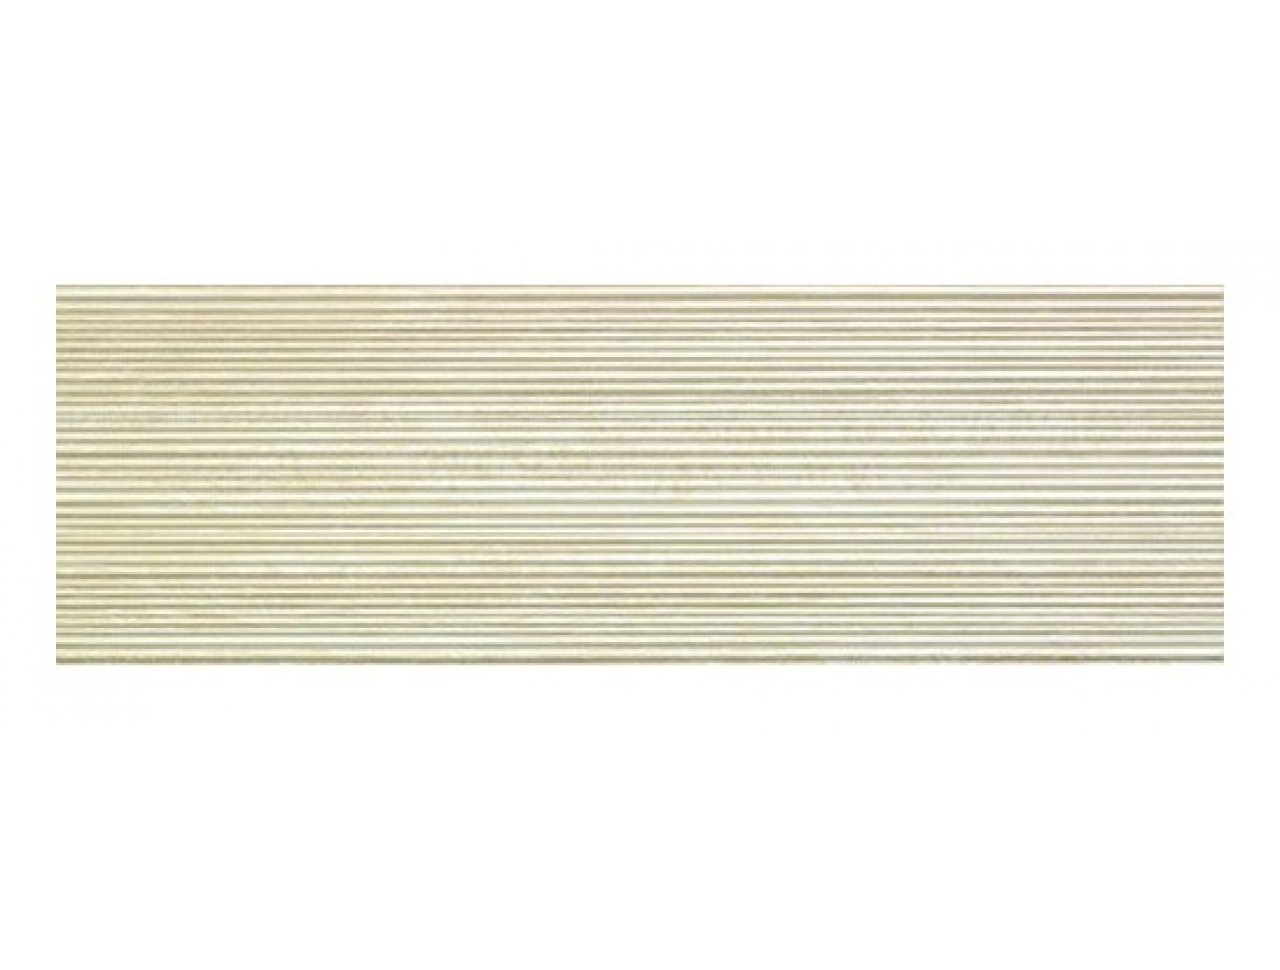 Настенная плитка FAP Roma Filo Travertino 75 x 25 см, Арт. fLSX